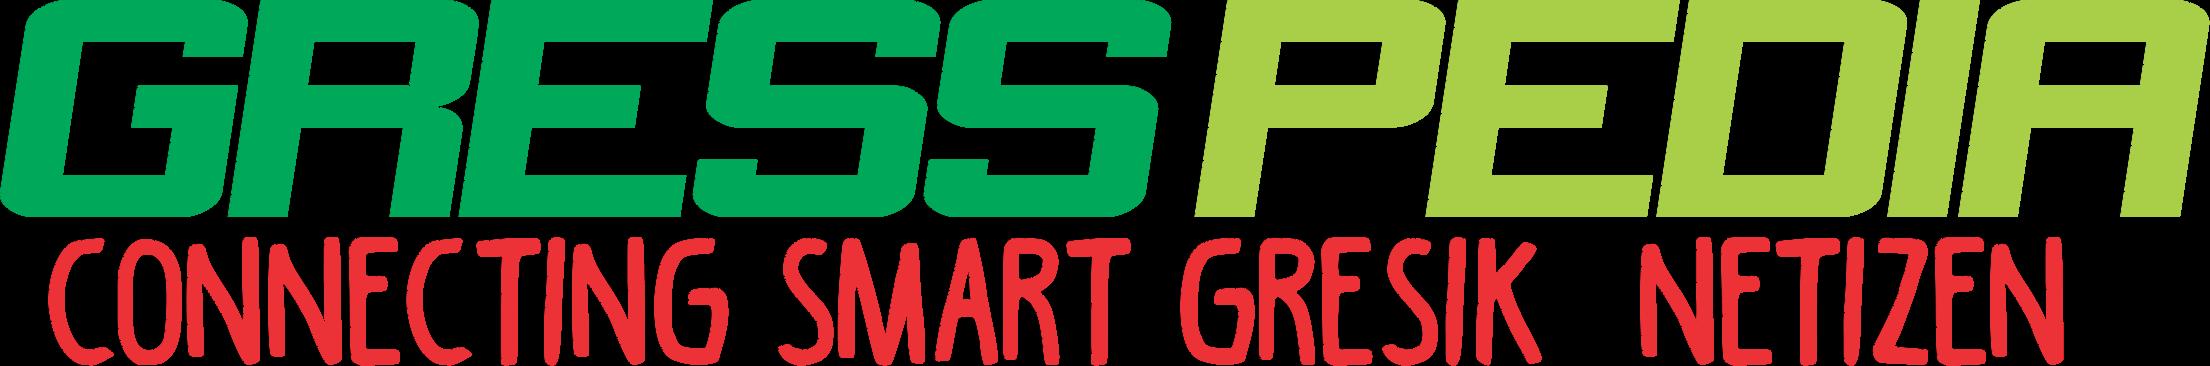 Gresspedia Gresik